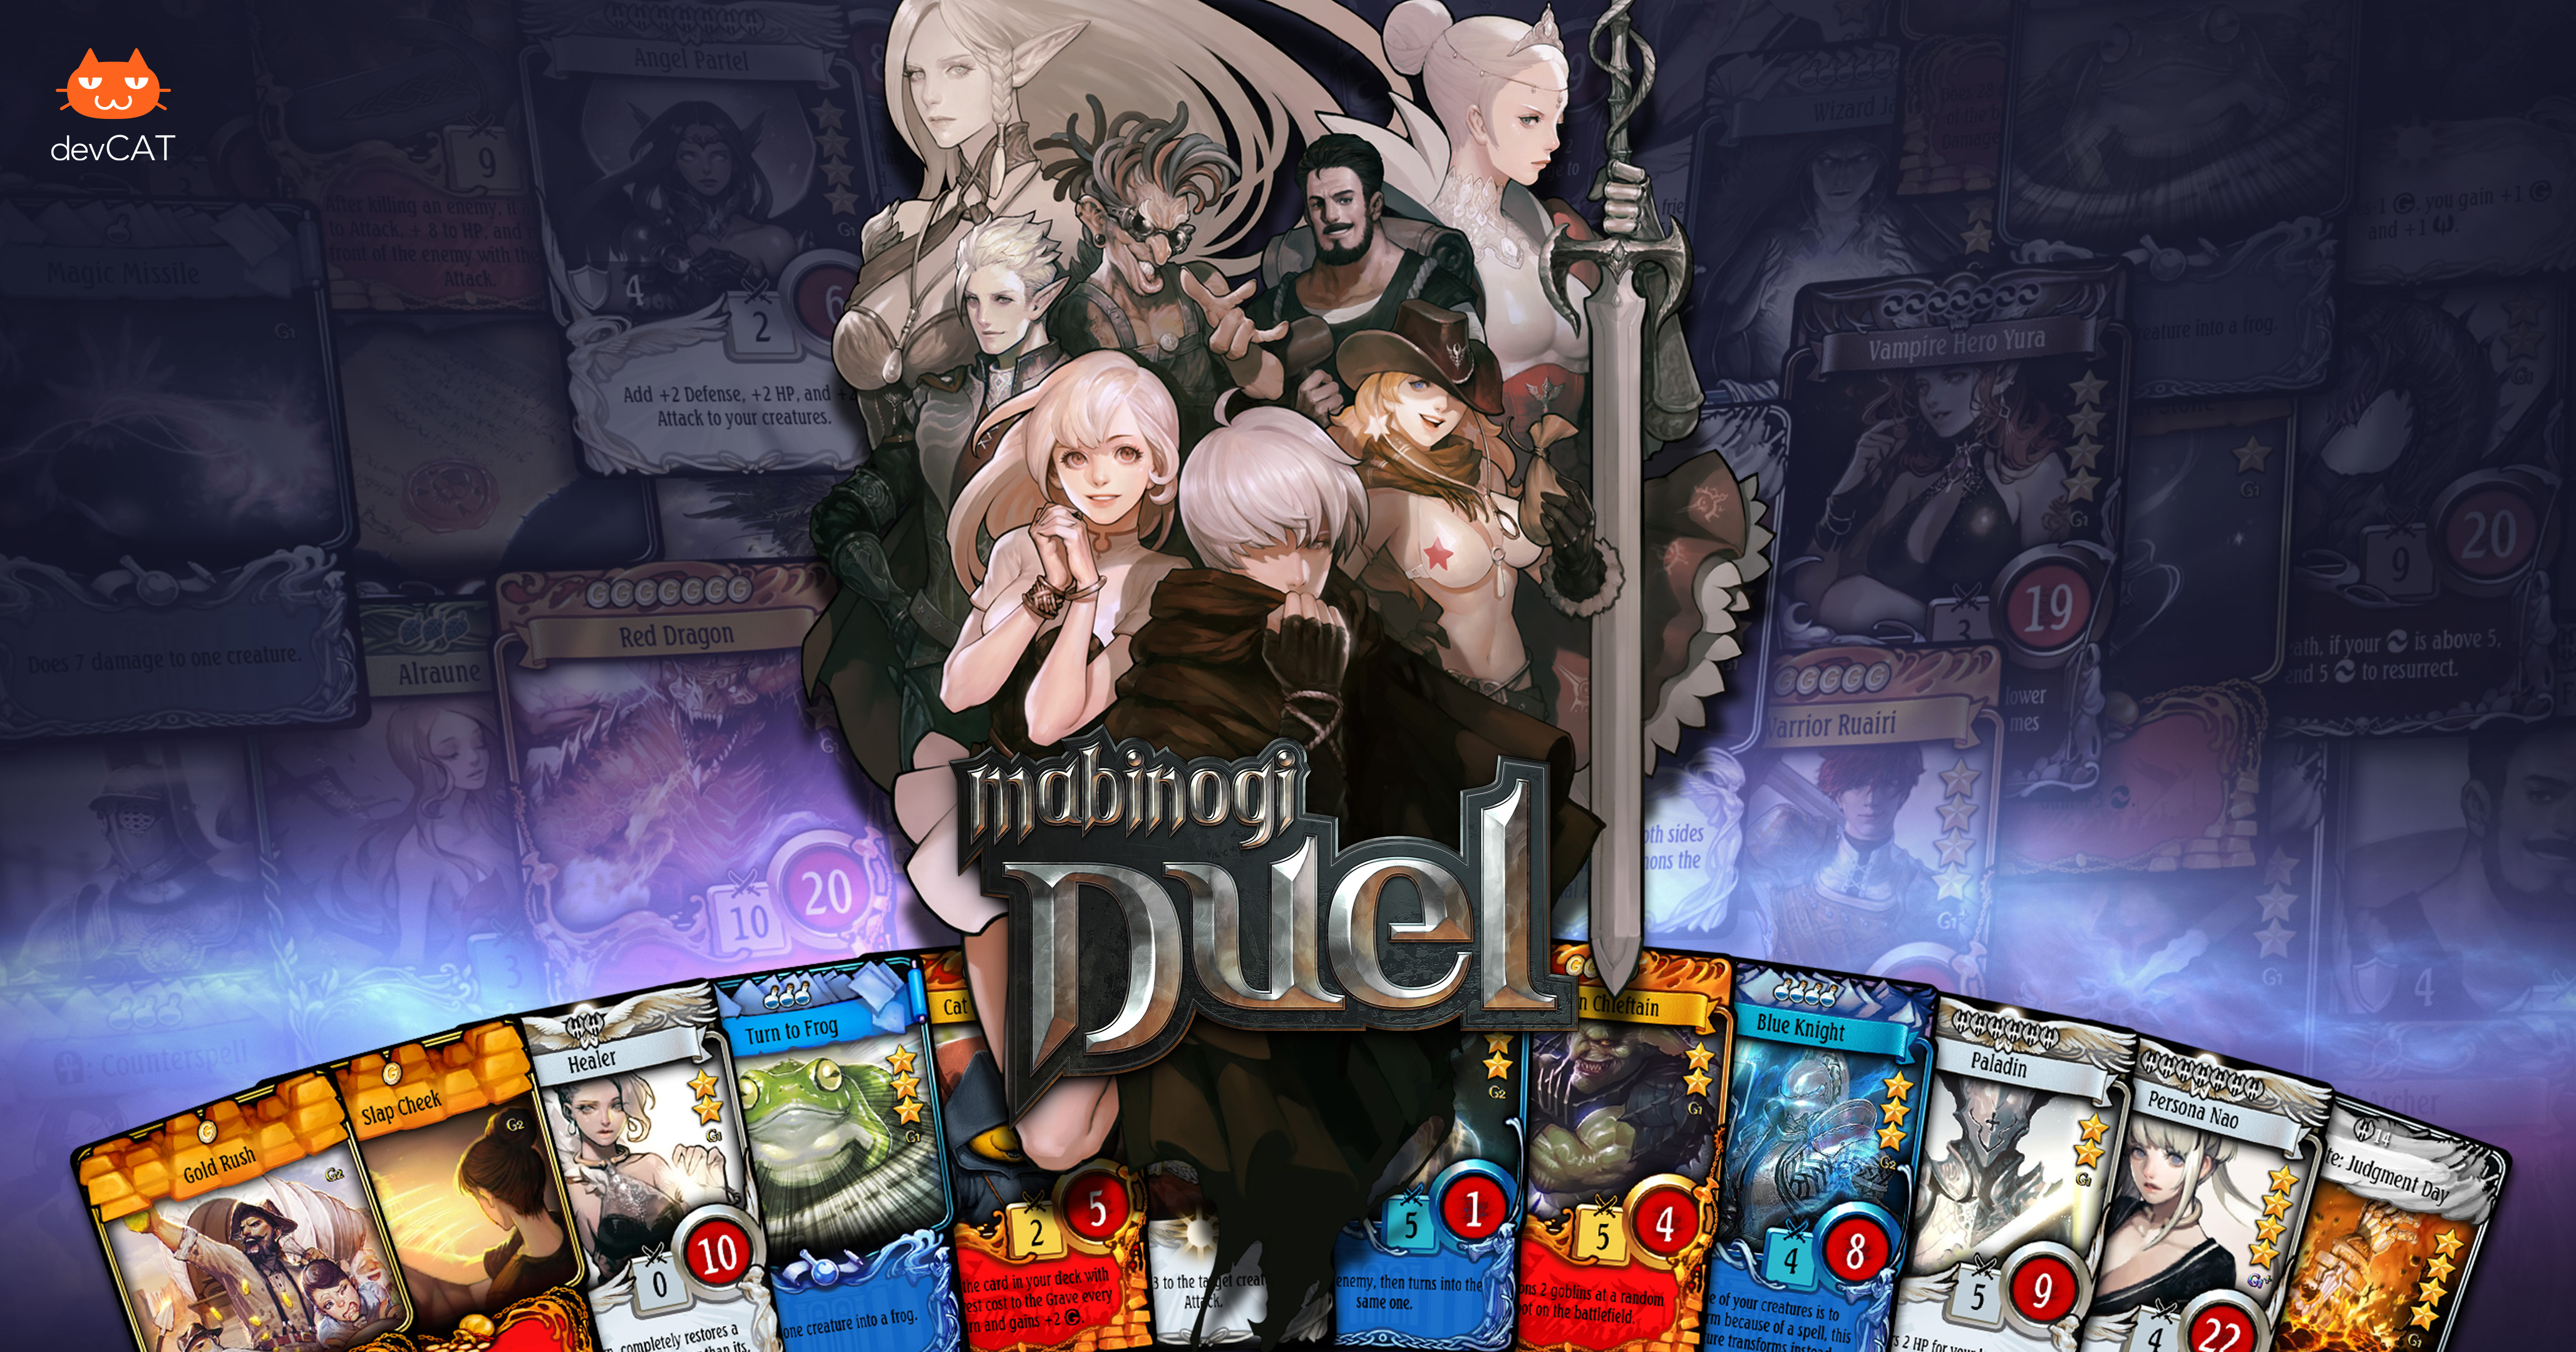 Upcoming Mabinogi Duel is a Hearthstone-like card battler